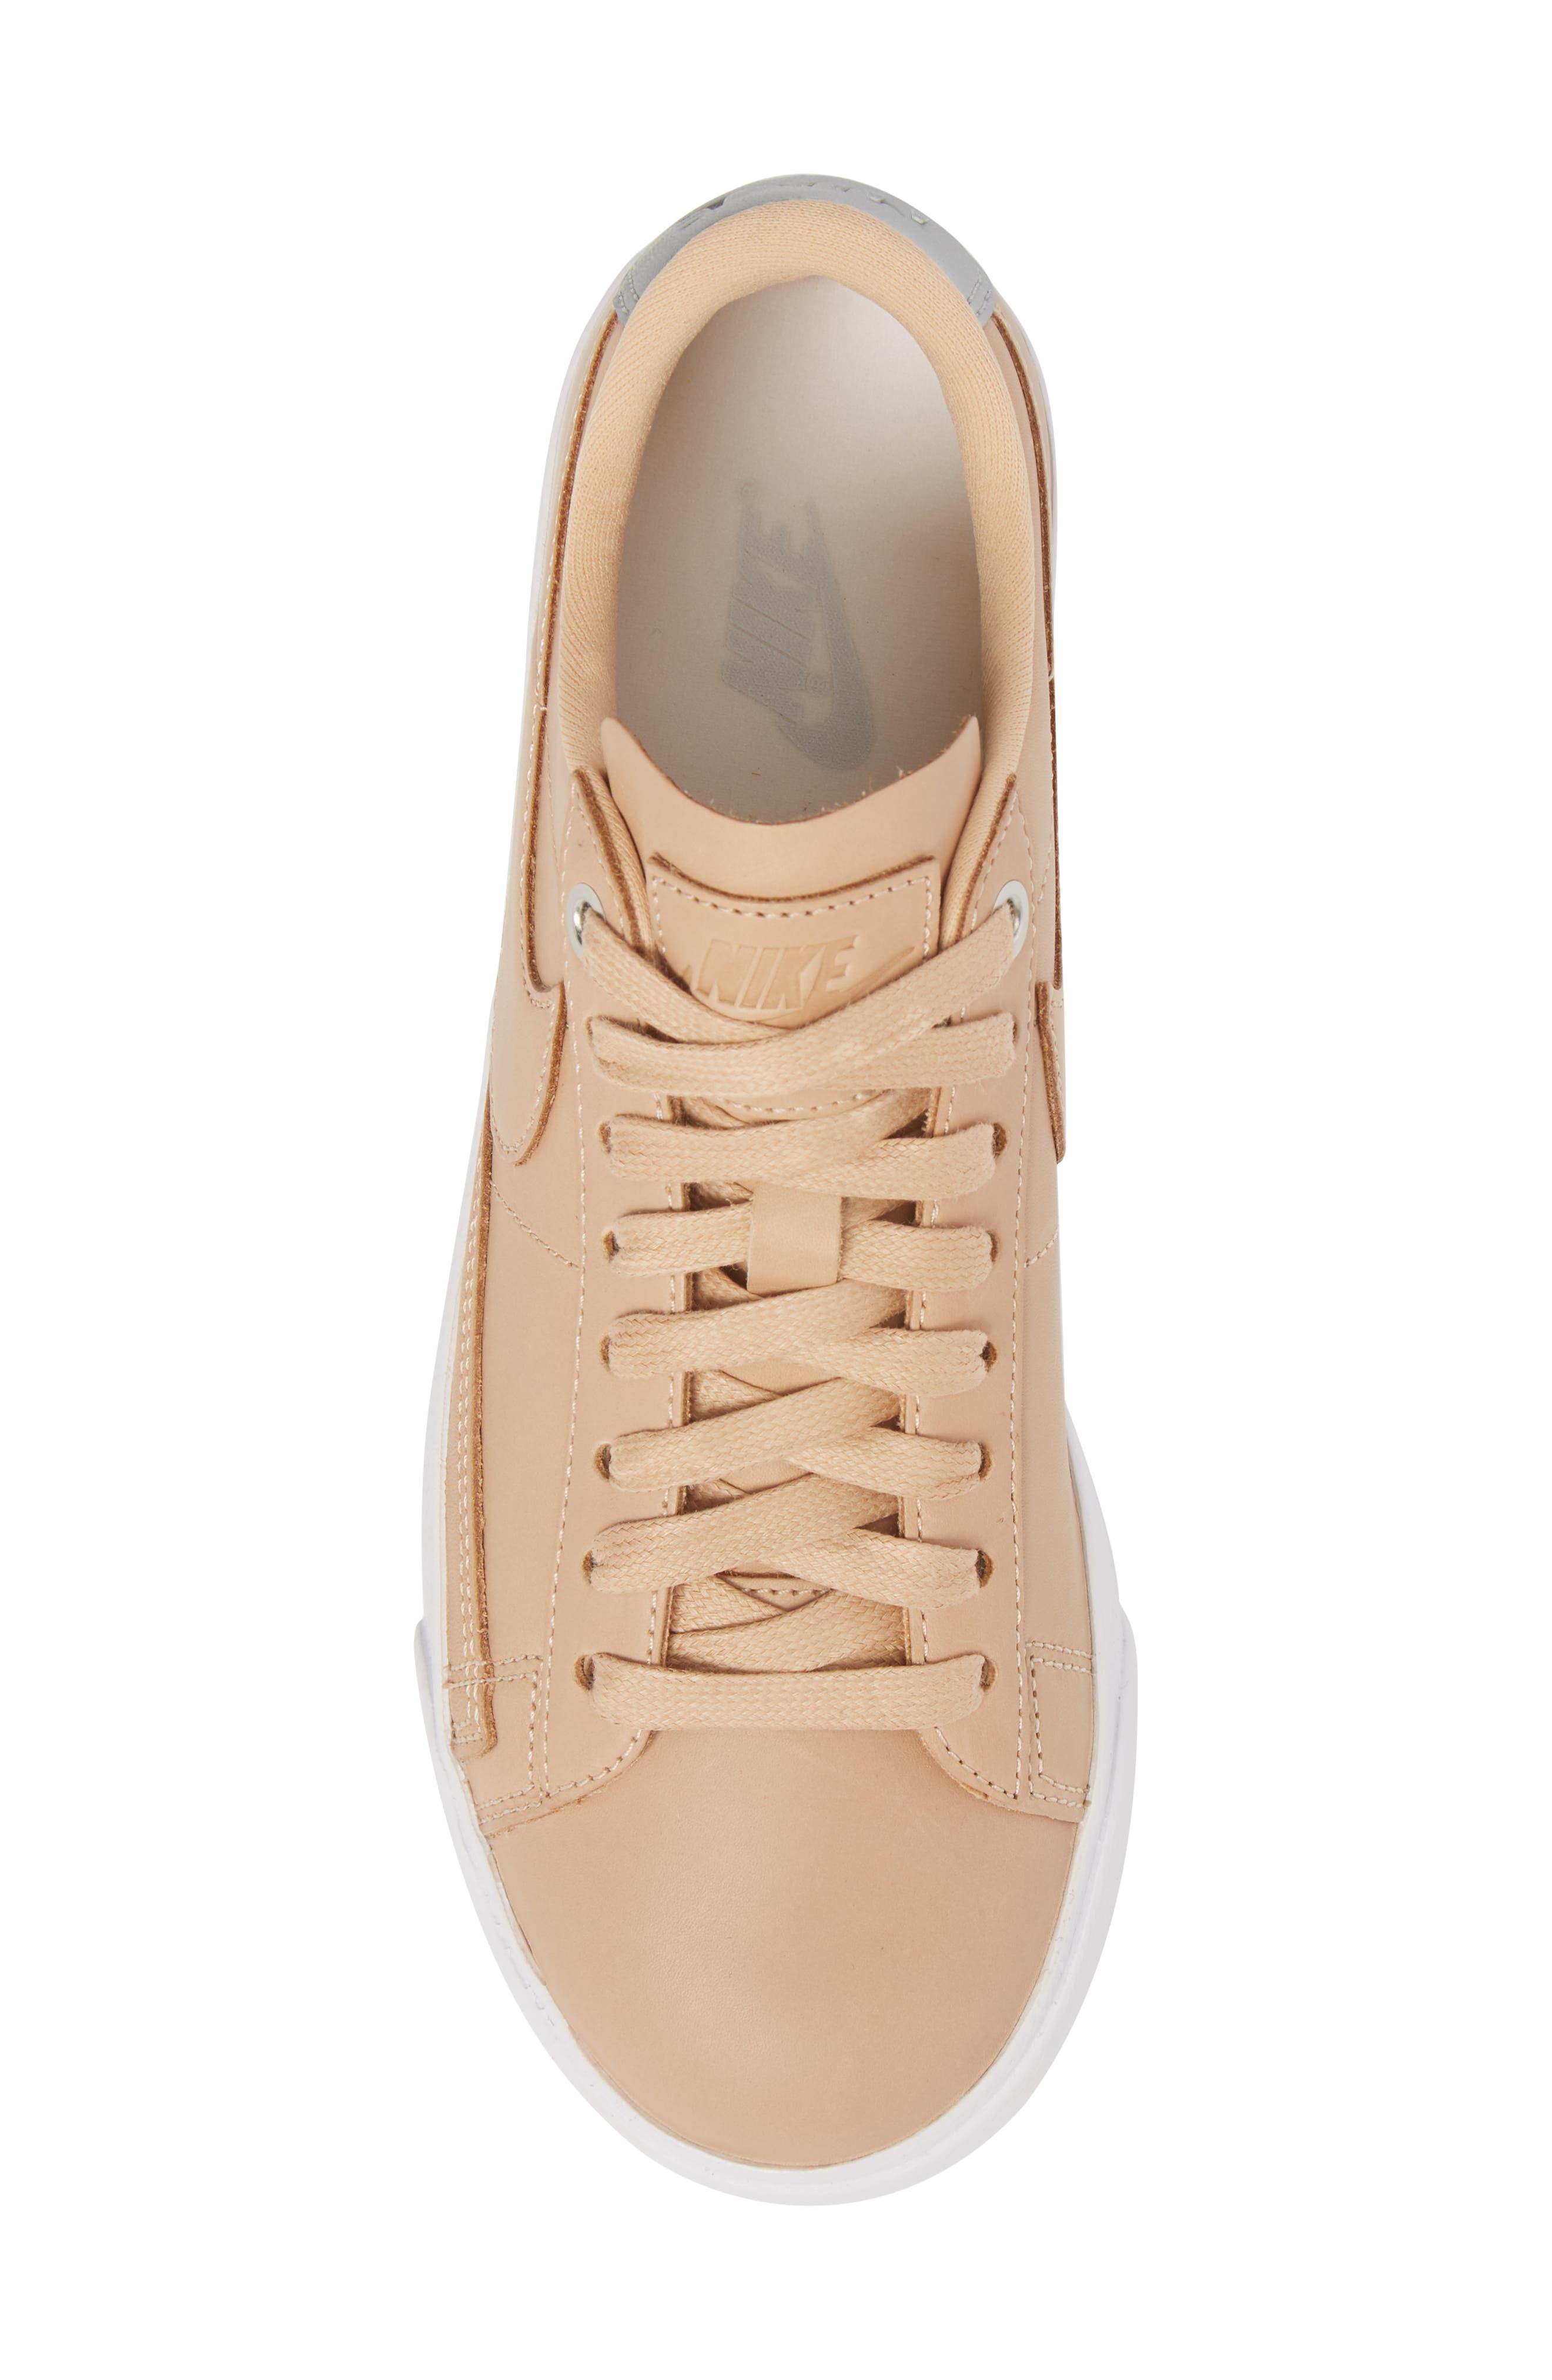 Blazer Low Top Sneaker SE,                             Alternate thumbnail 5, color,                             BIO BEIGE/ BIO BEIGE